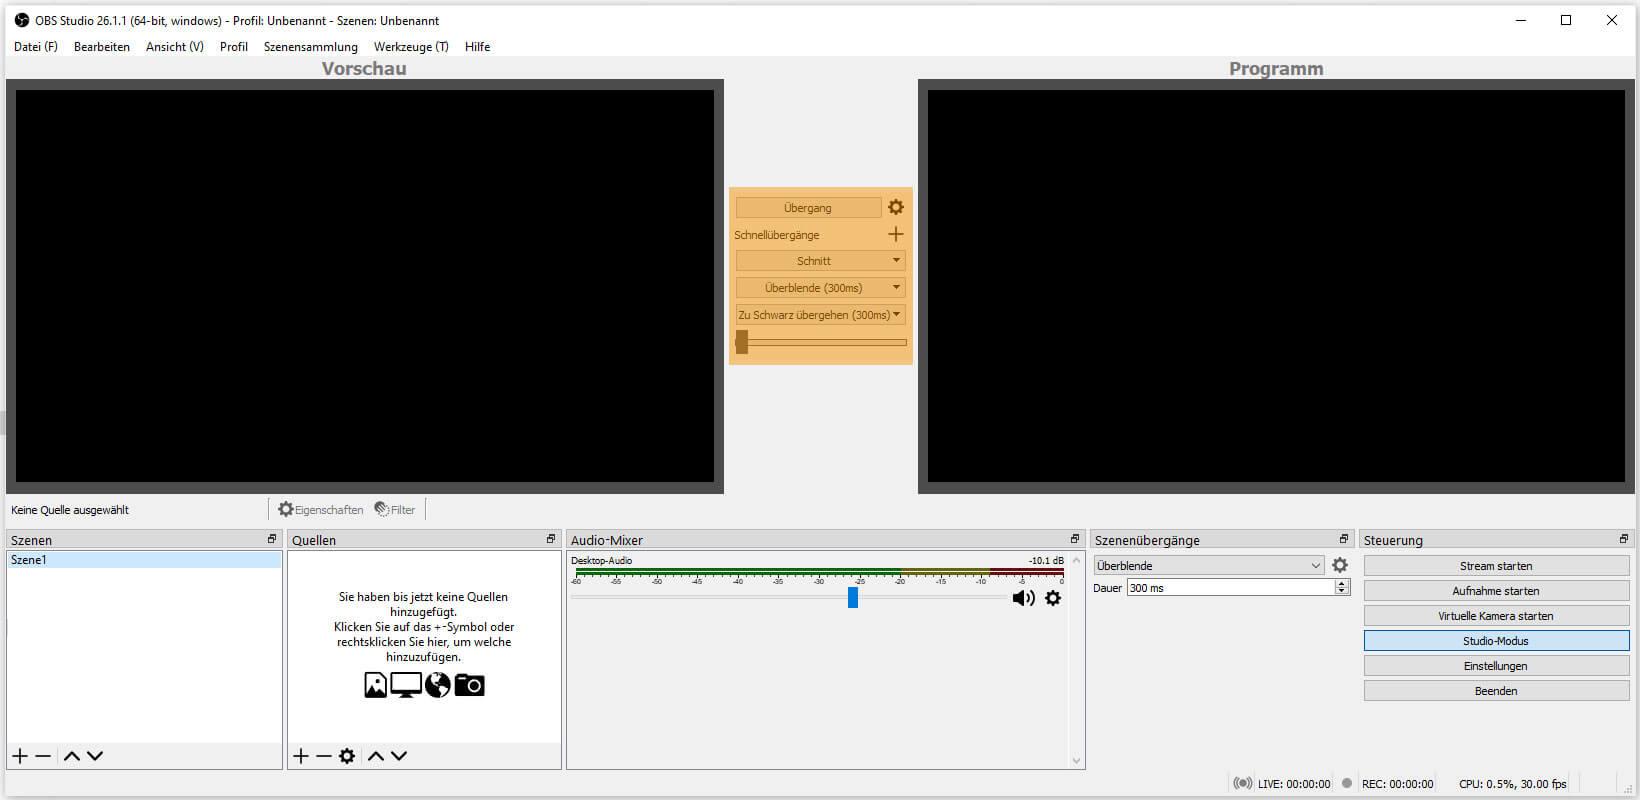 OBS Studio 26.1.1 – Steuerung - Studio-Modus - Übergang